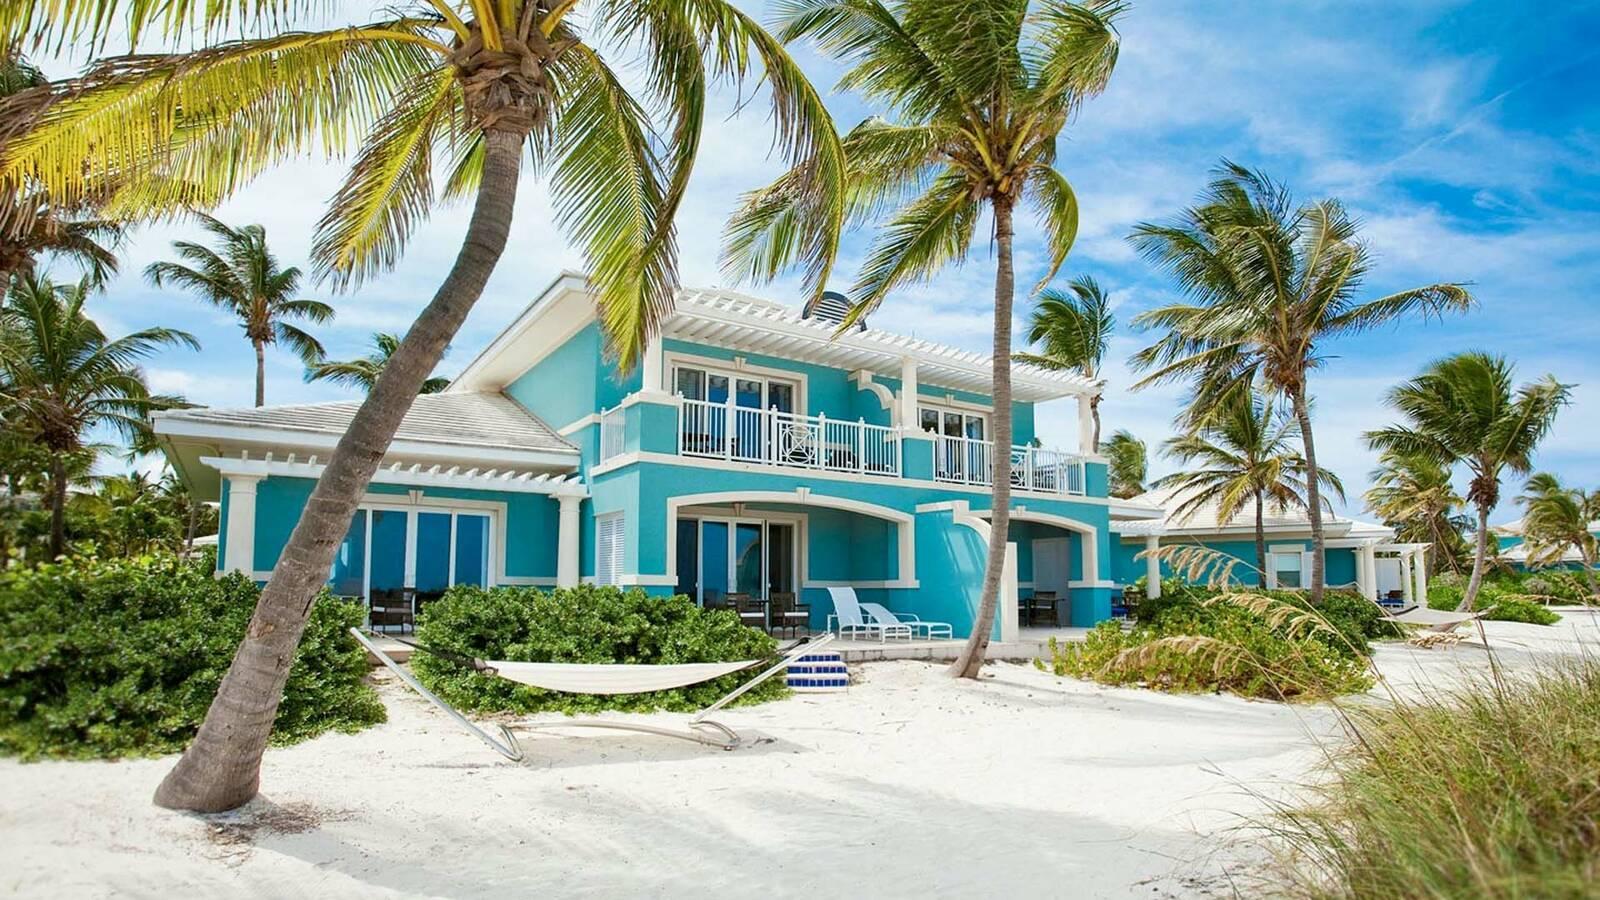 Sandals Emerald Bay Exuma Bahamas TwoStory Villa